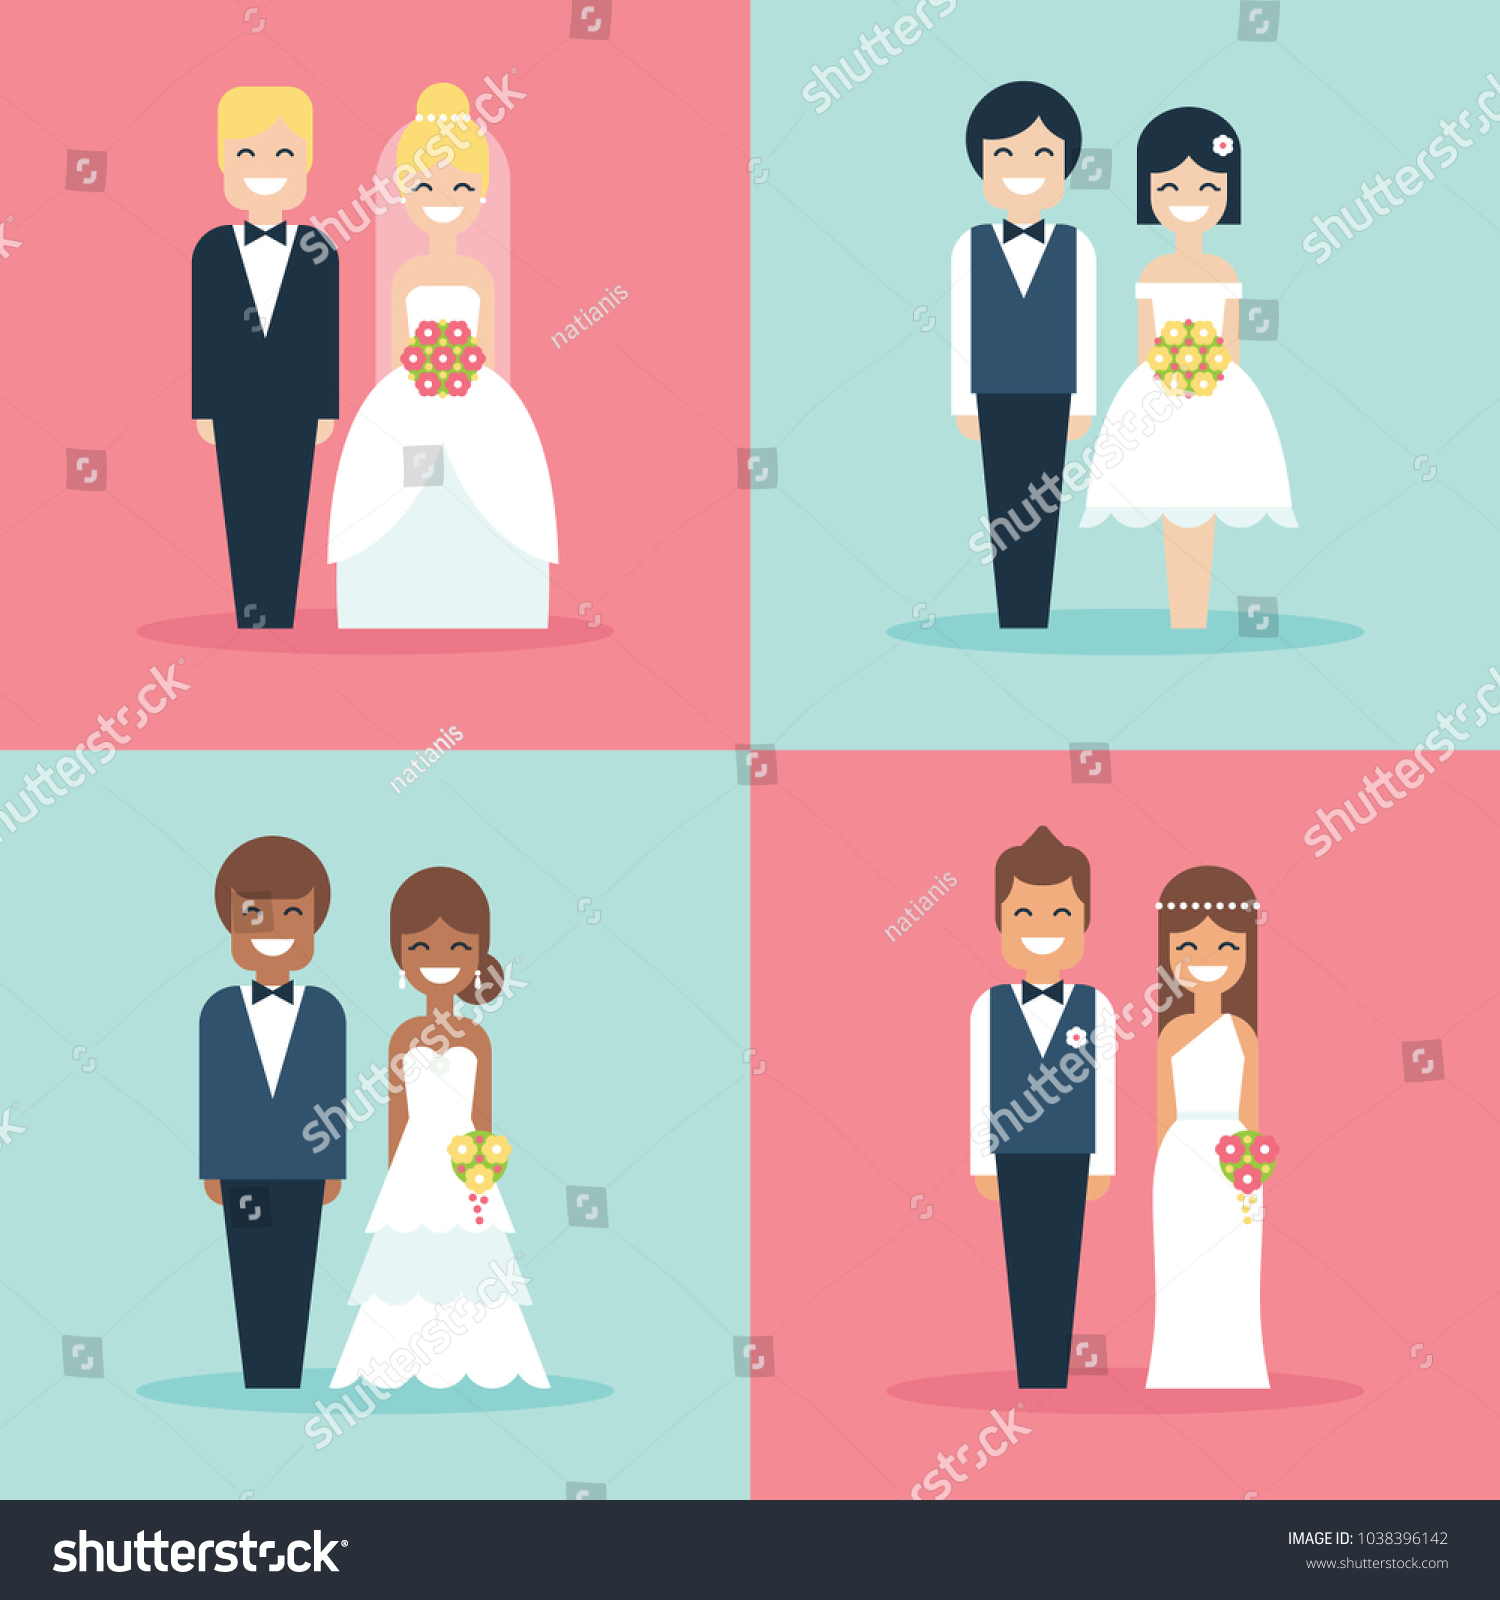 Cute Bride Groom Wedding Cake Toppers Stock Vector (Royalty Free ...